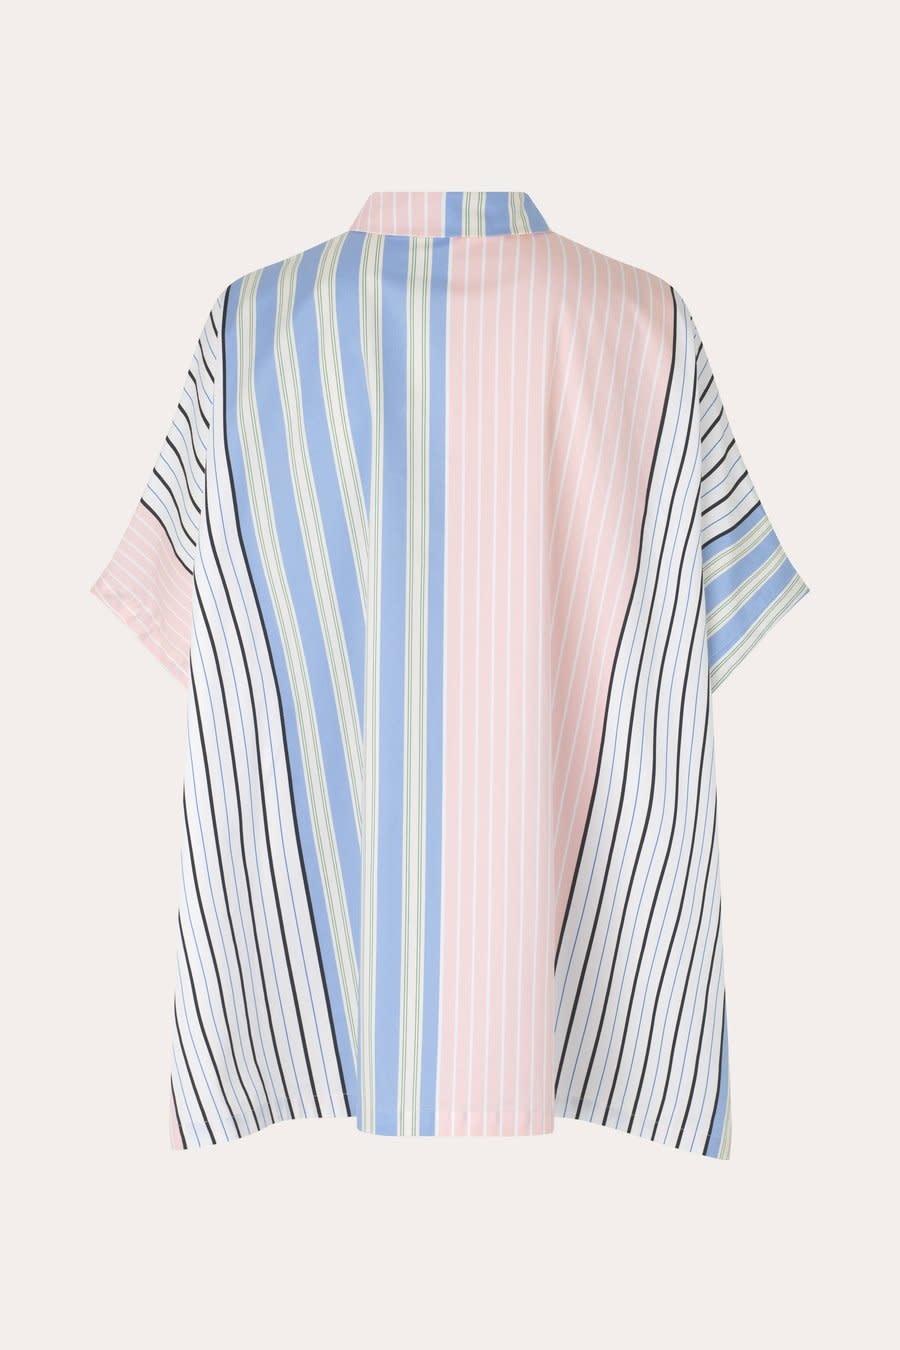 Luna shirt flowermarket-2